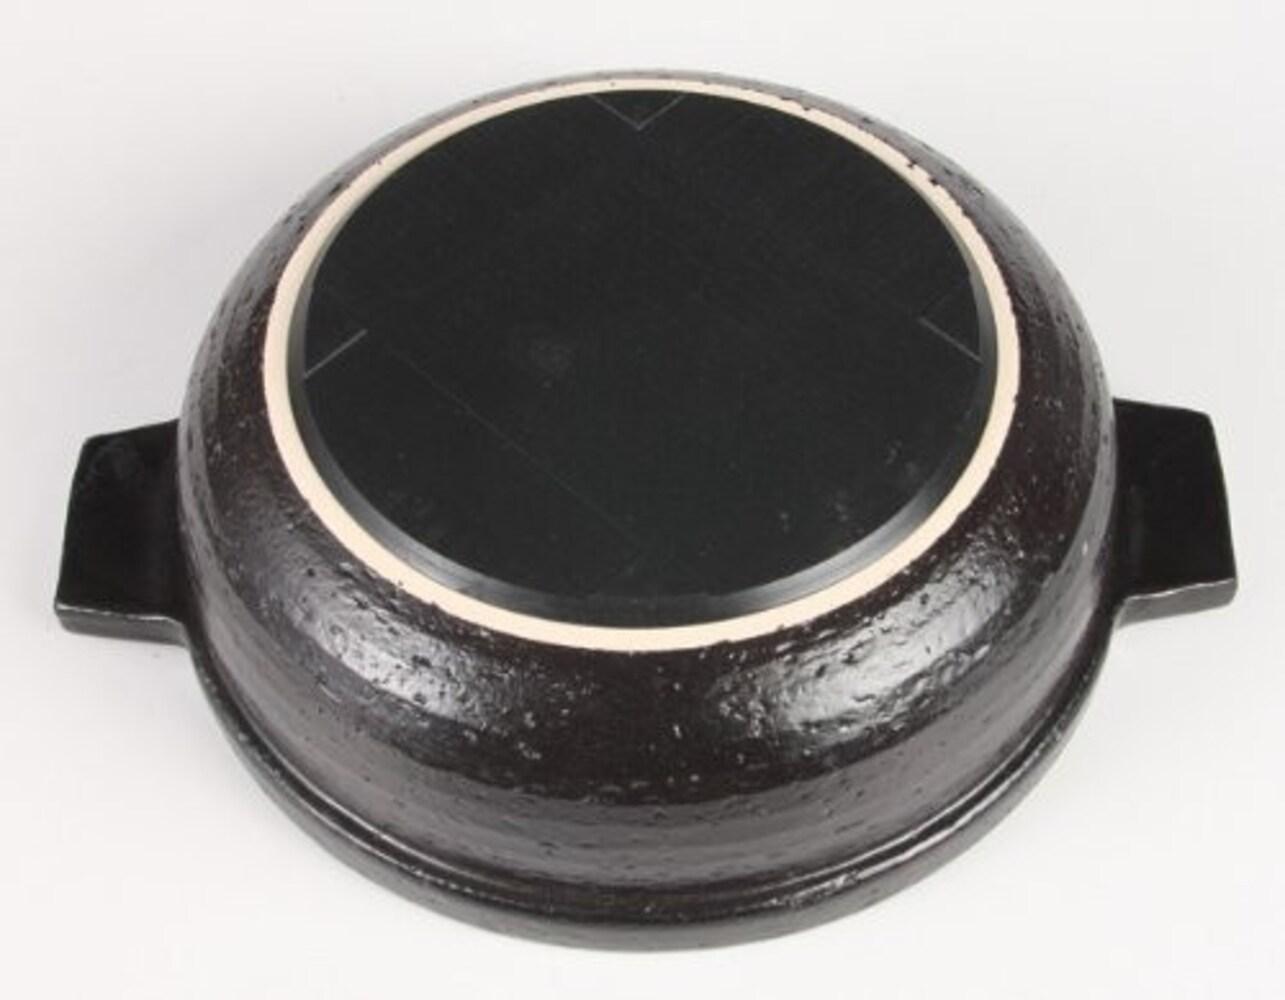 IH対応の土鍋の裏側